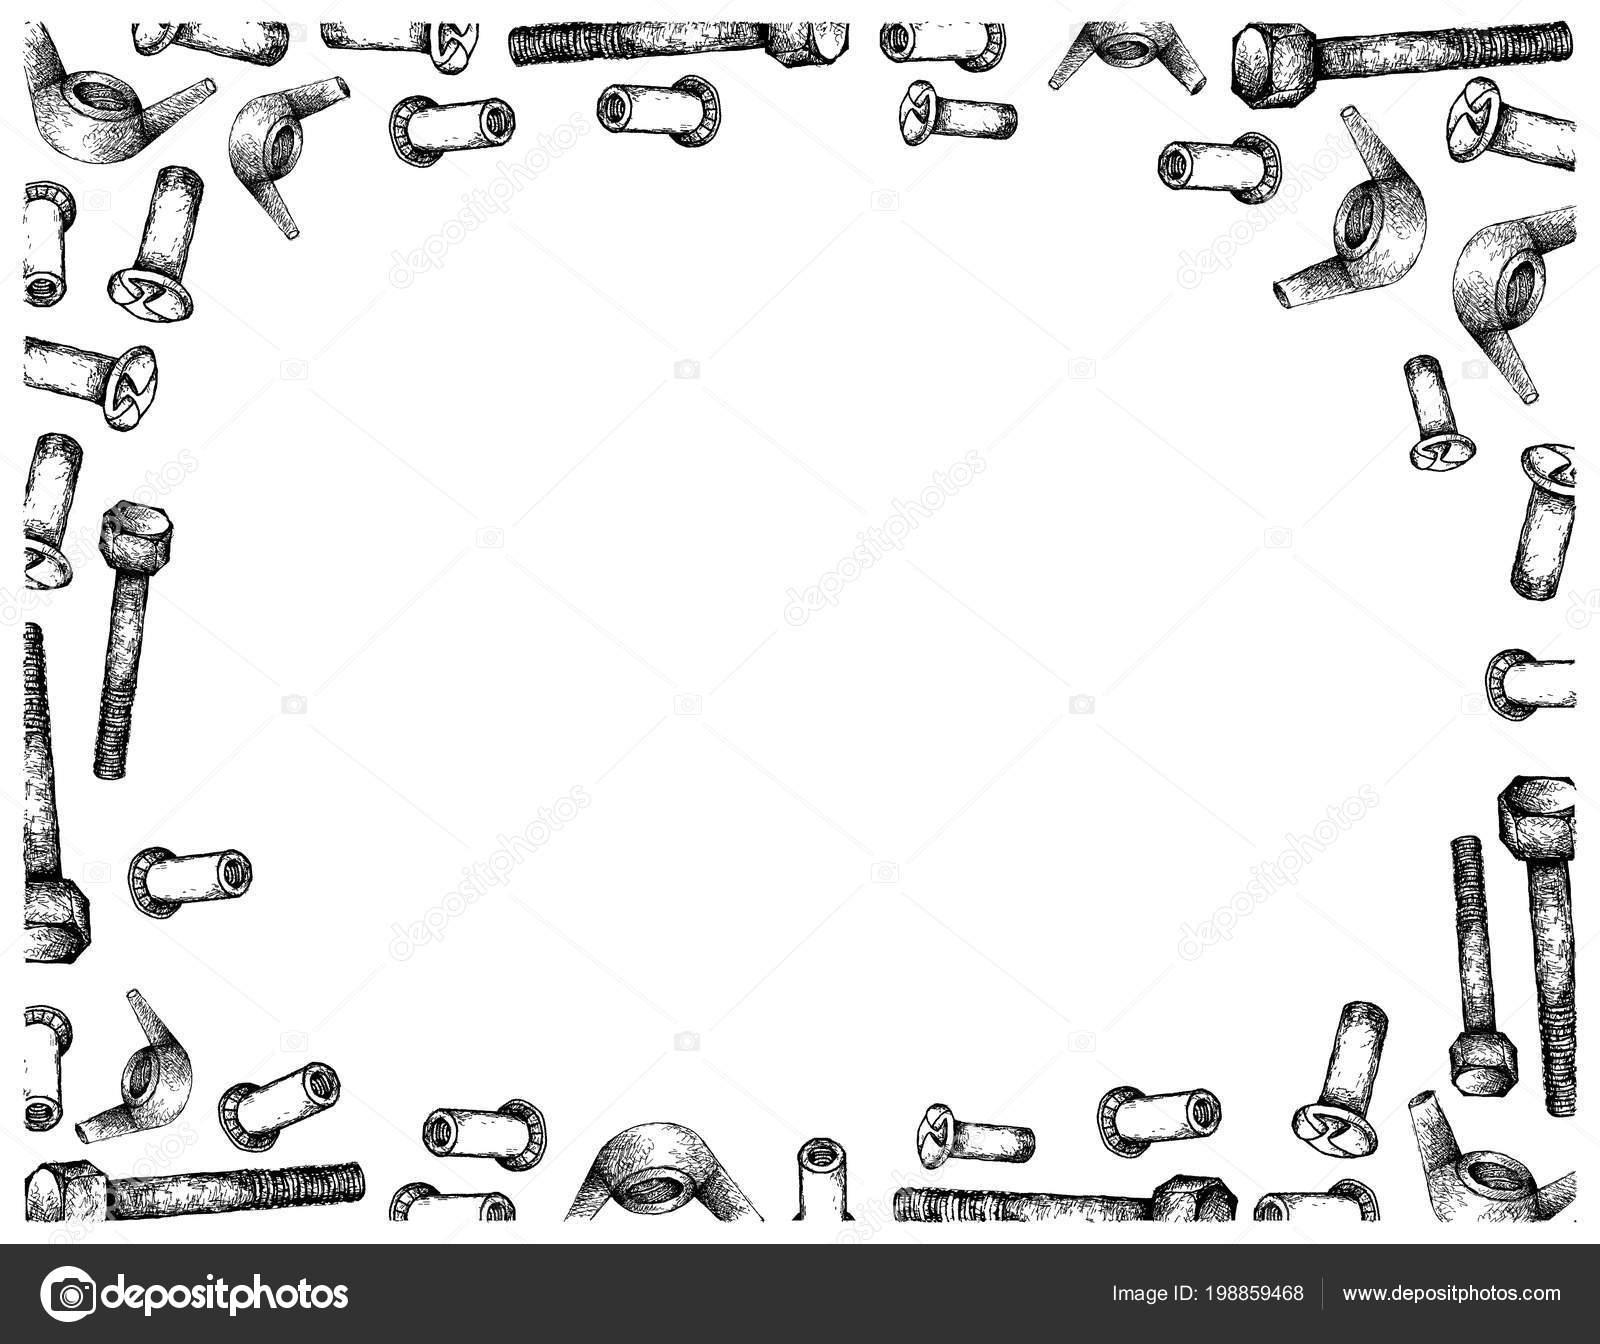 Ruský kreslený sex